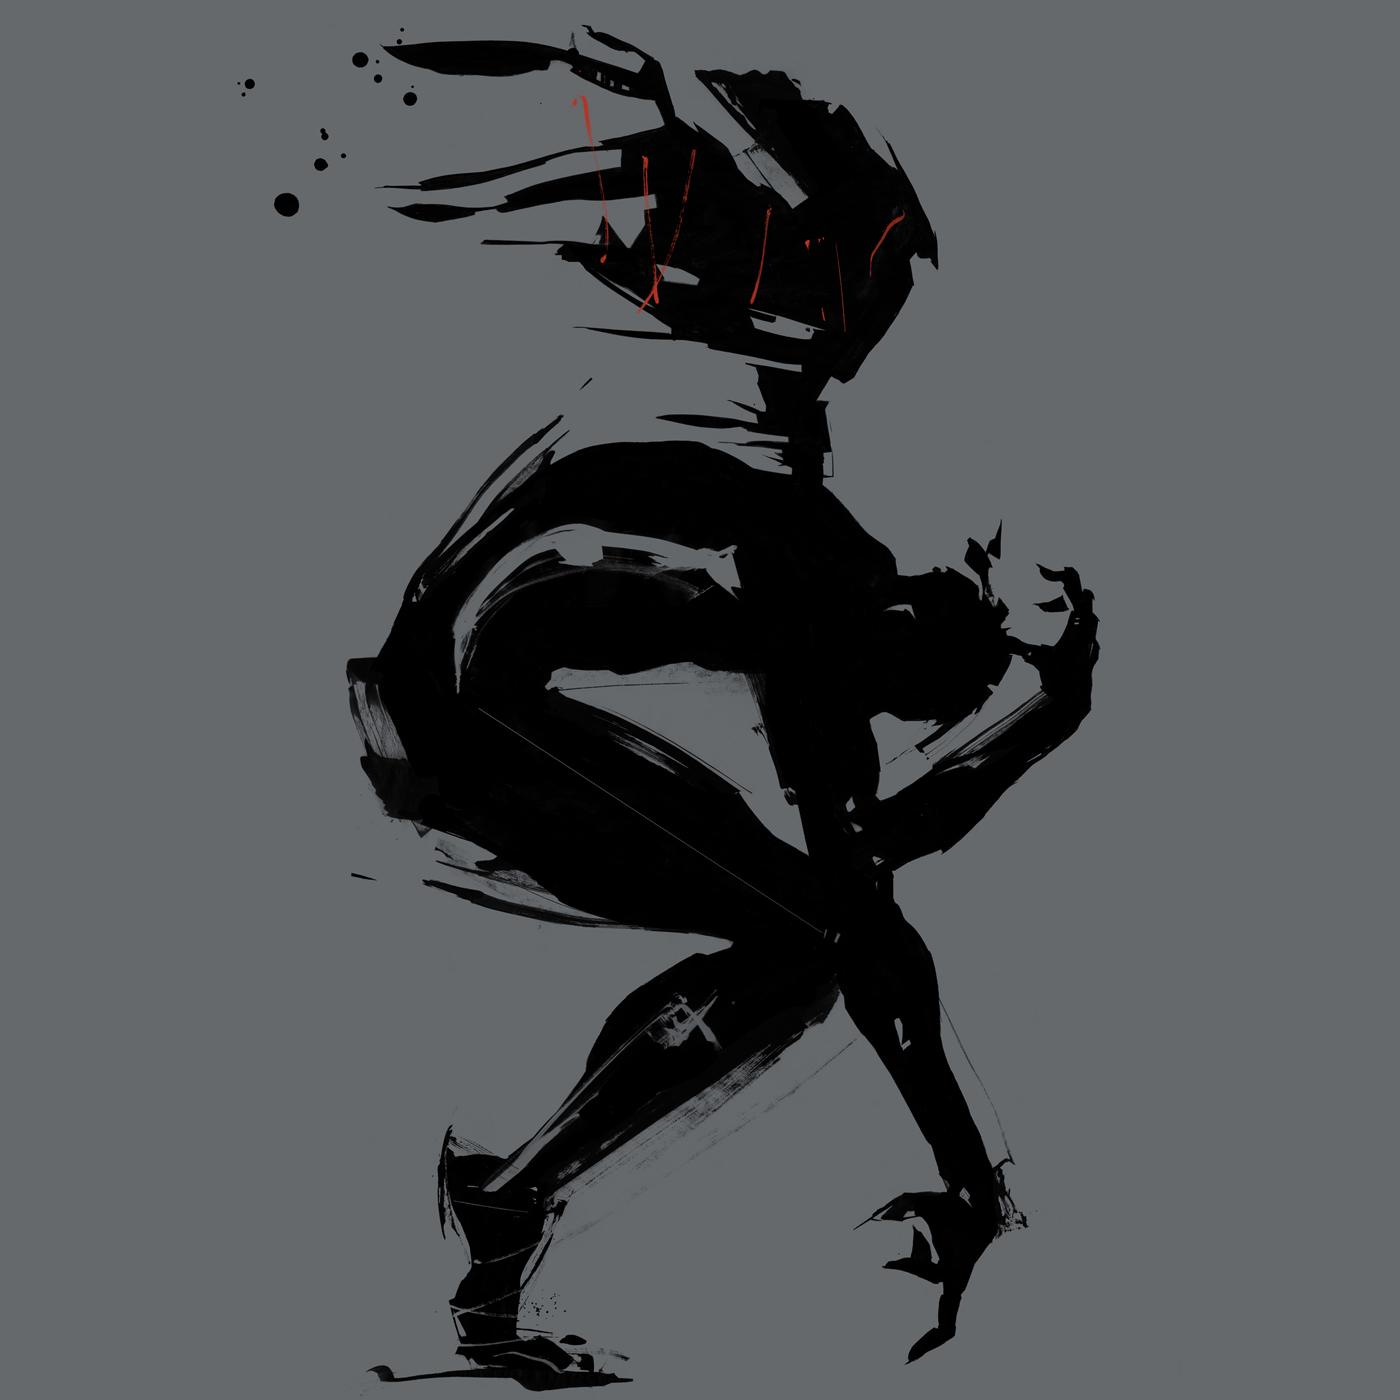 hdw.demon.be.jpg